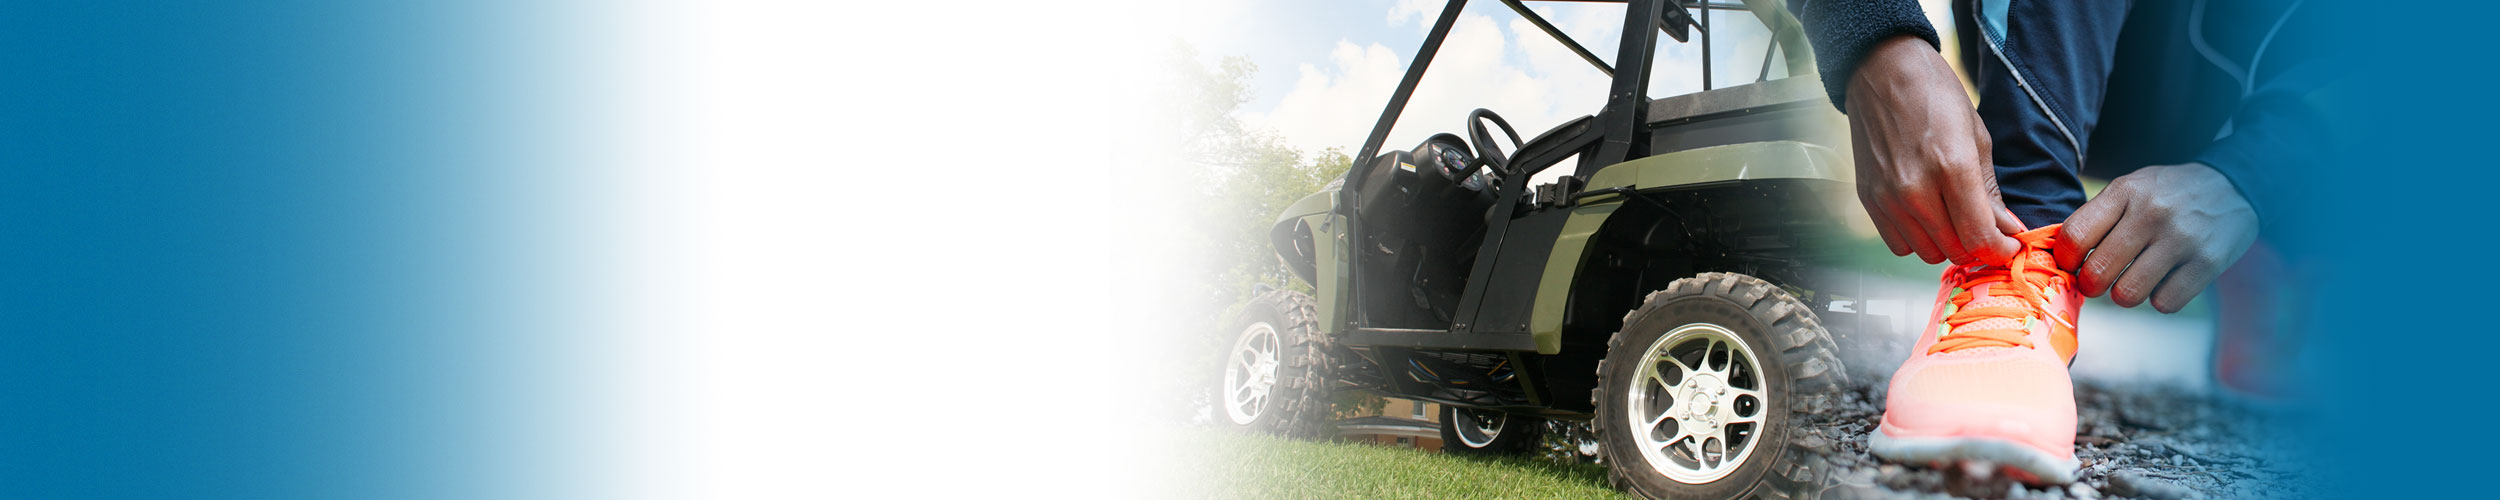 Aurora Plastics ATV and Flexible Applications